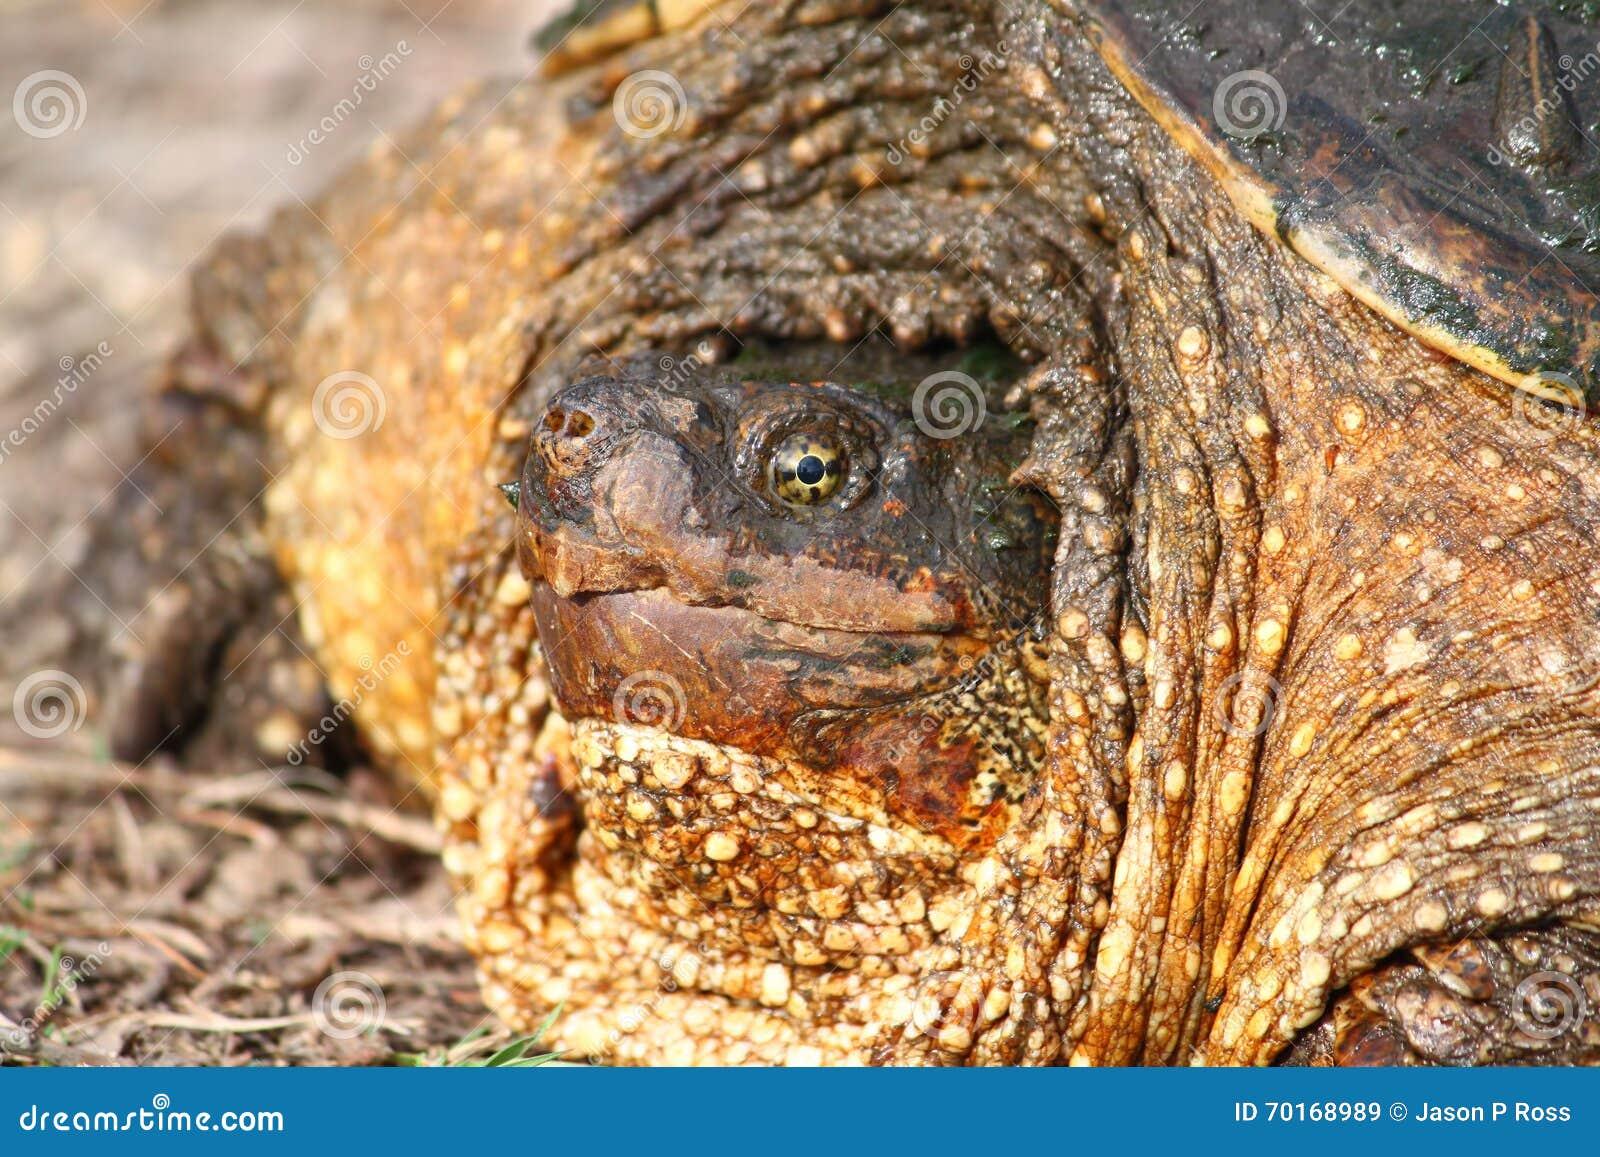 Snapping Turtle Illinois Wildlife Stock Image - Image of chelydra